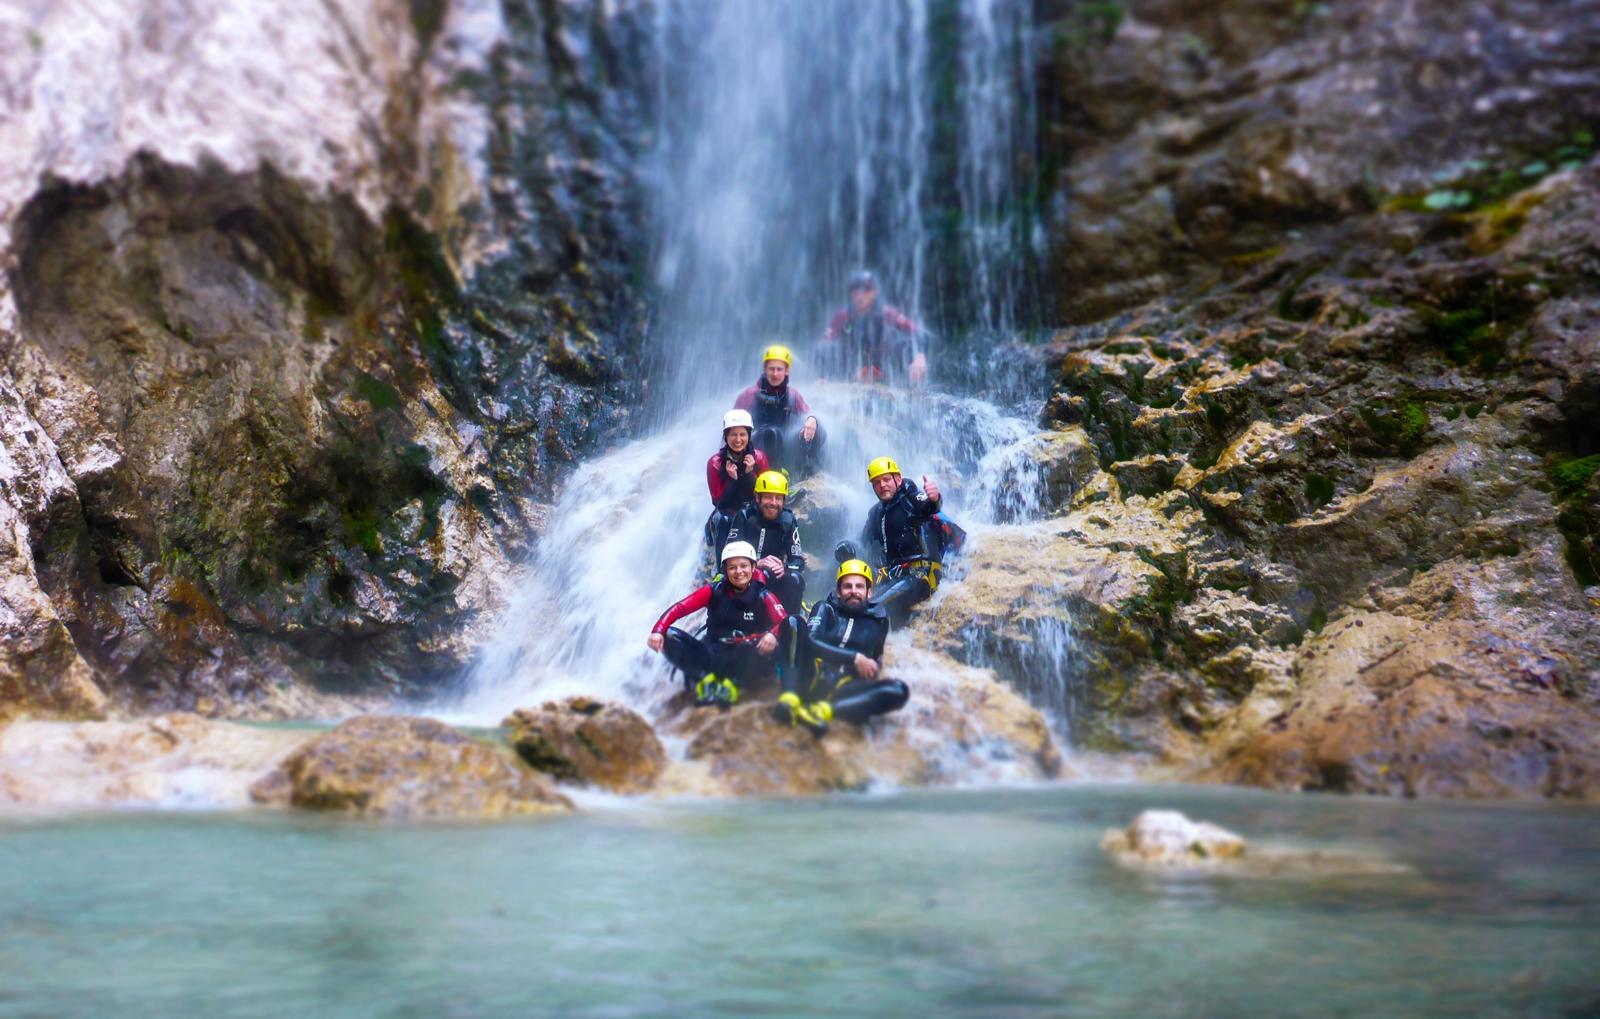 canyoning-tour-schneizlreuth-bg6